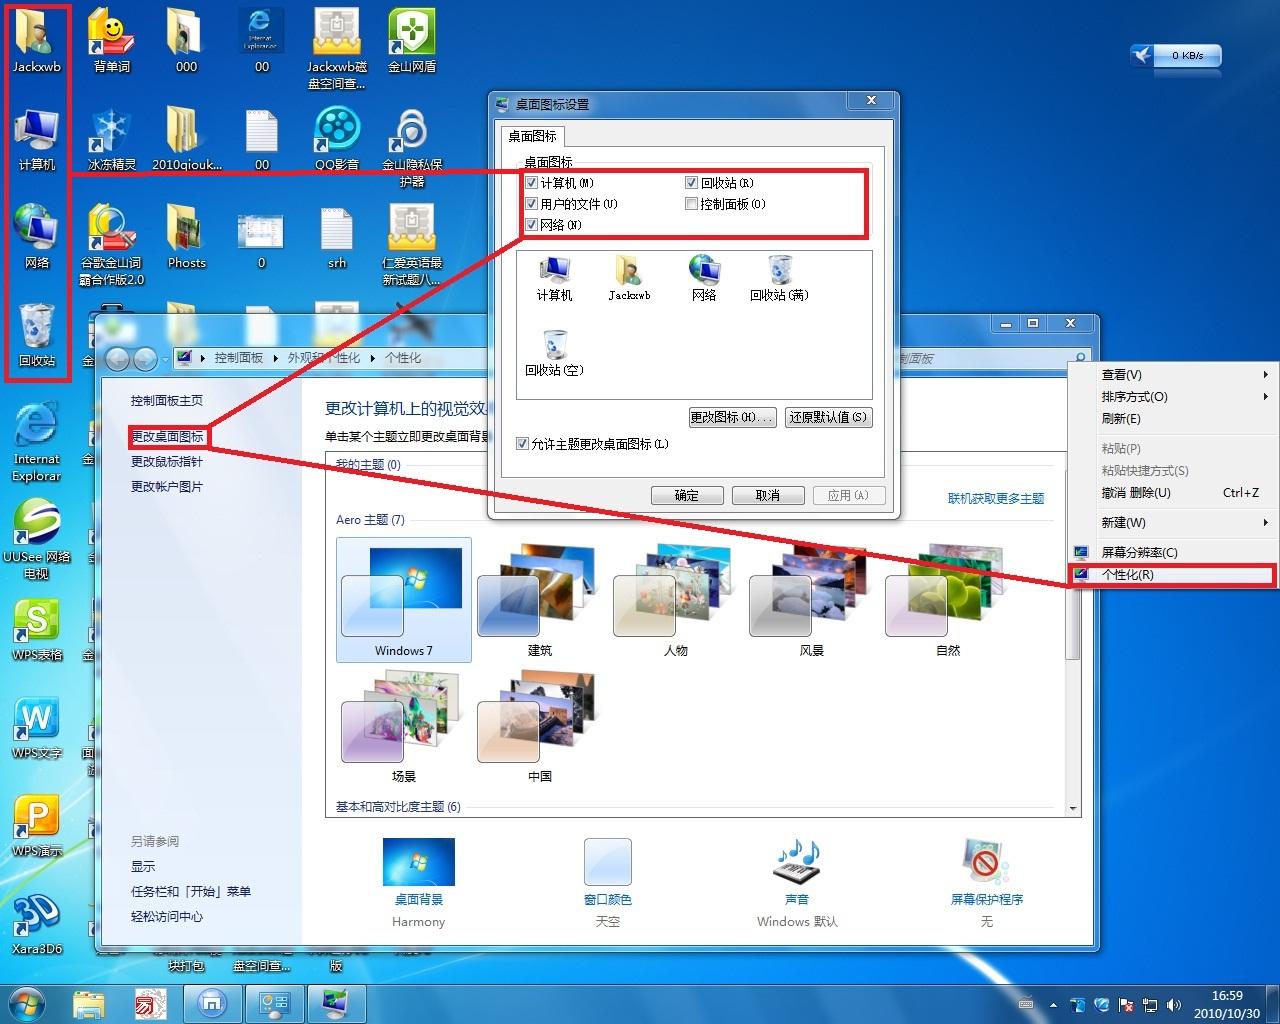 win7桌面显示小图标_我想把xp的系统换成win7的,装完系统之后桌面只有几个图标。是 ...